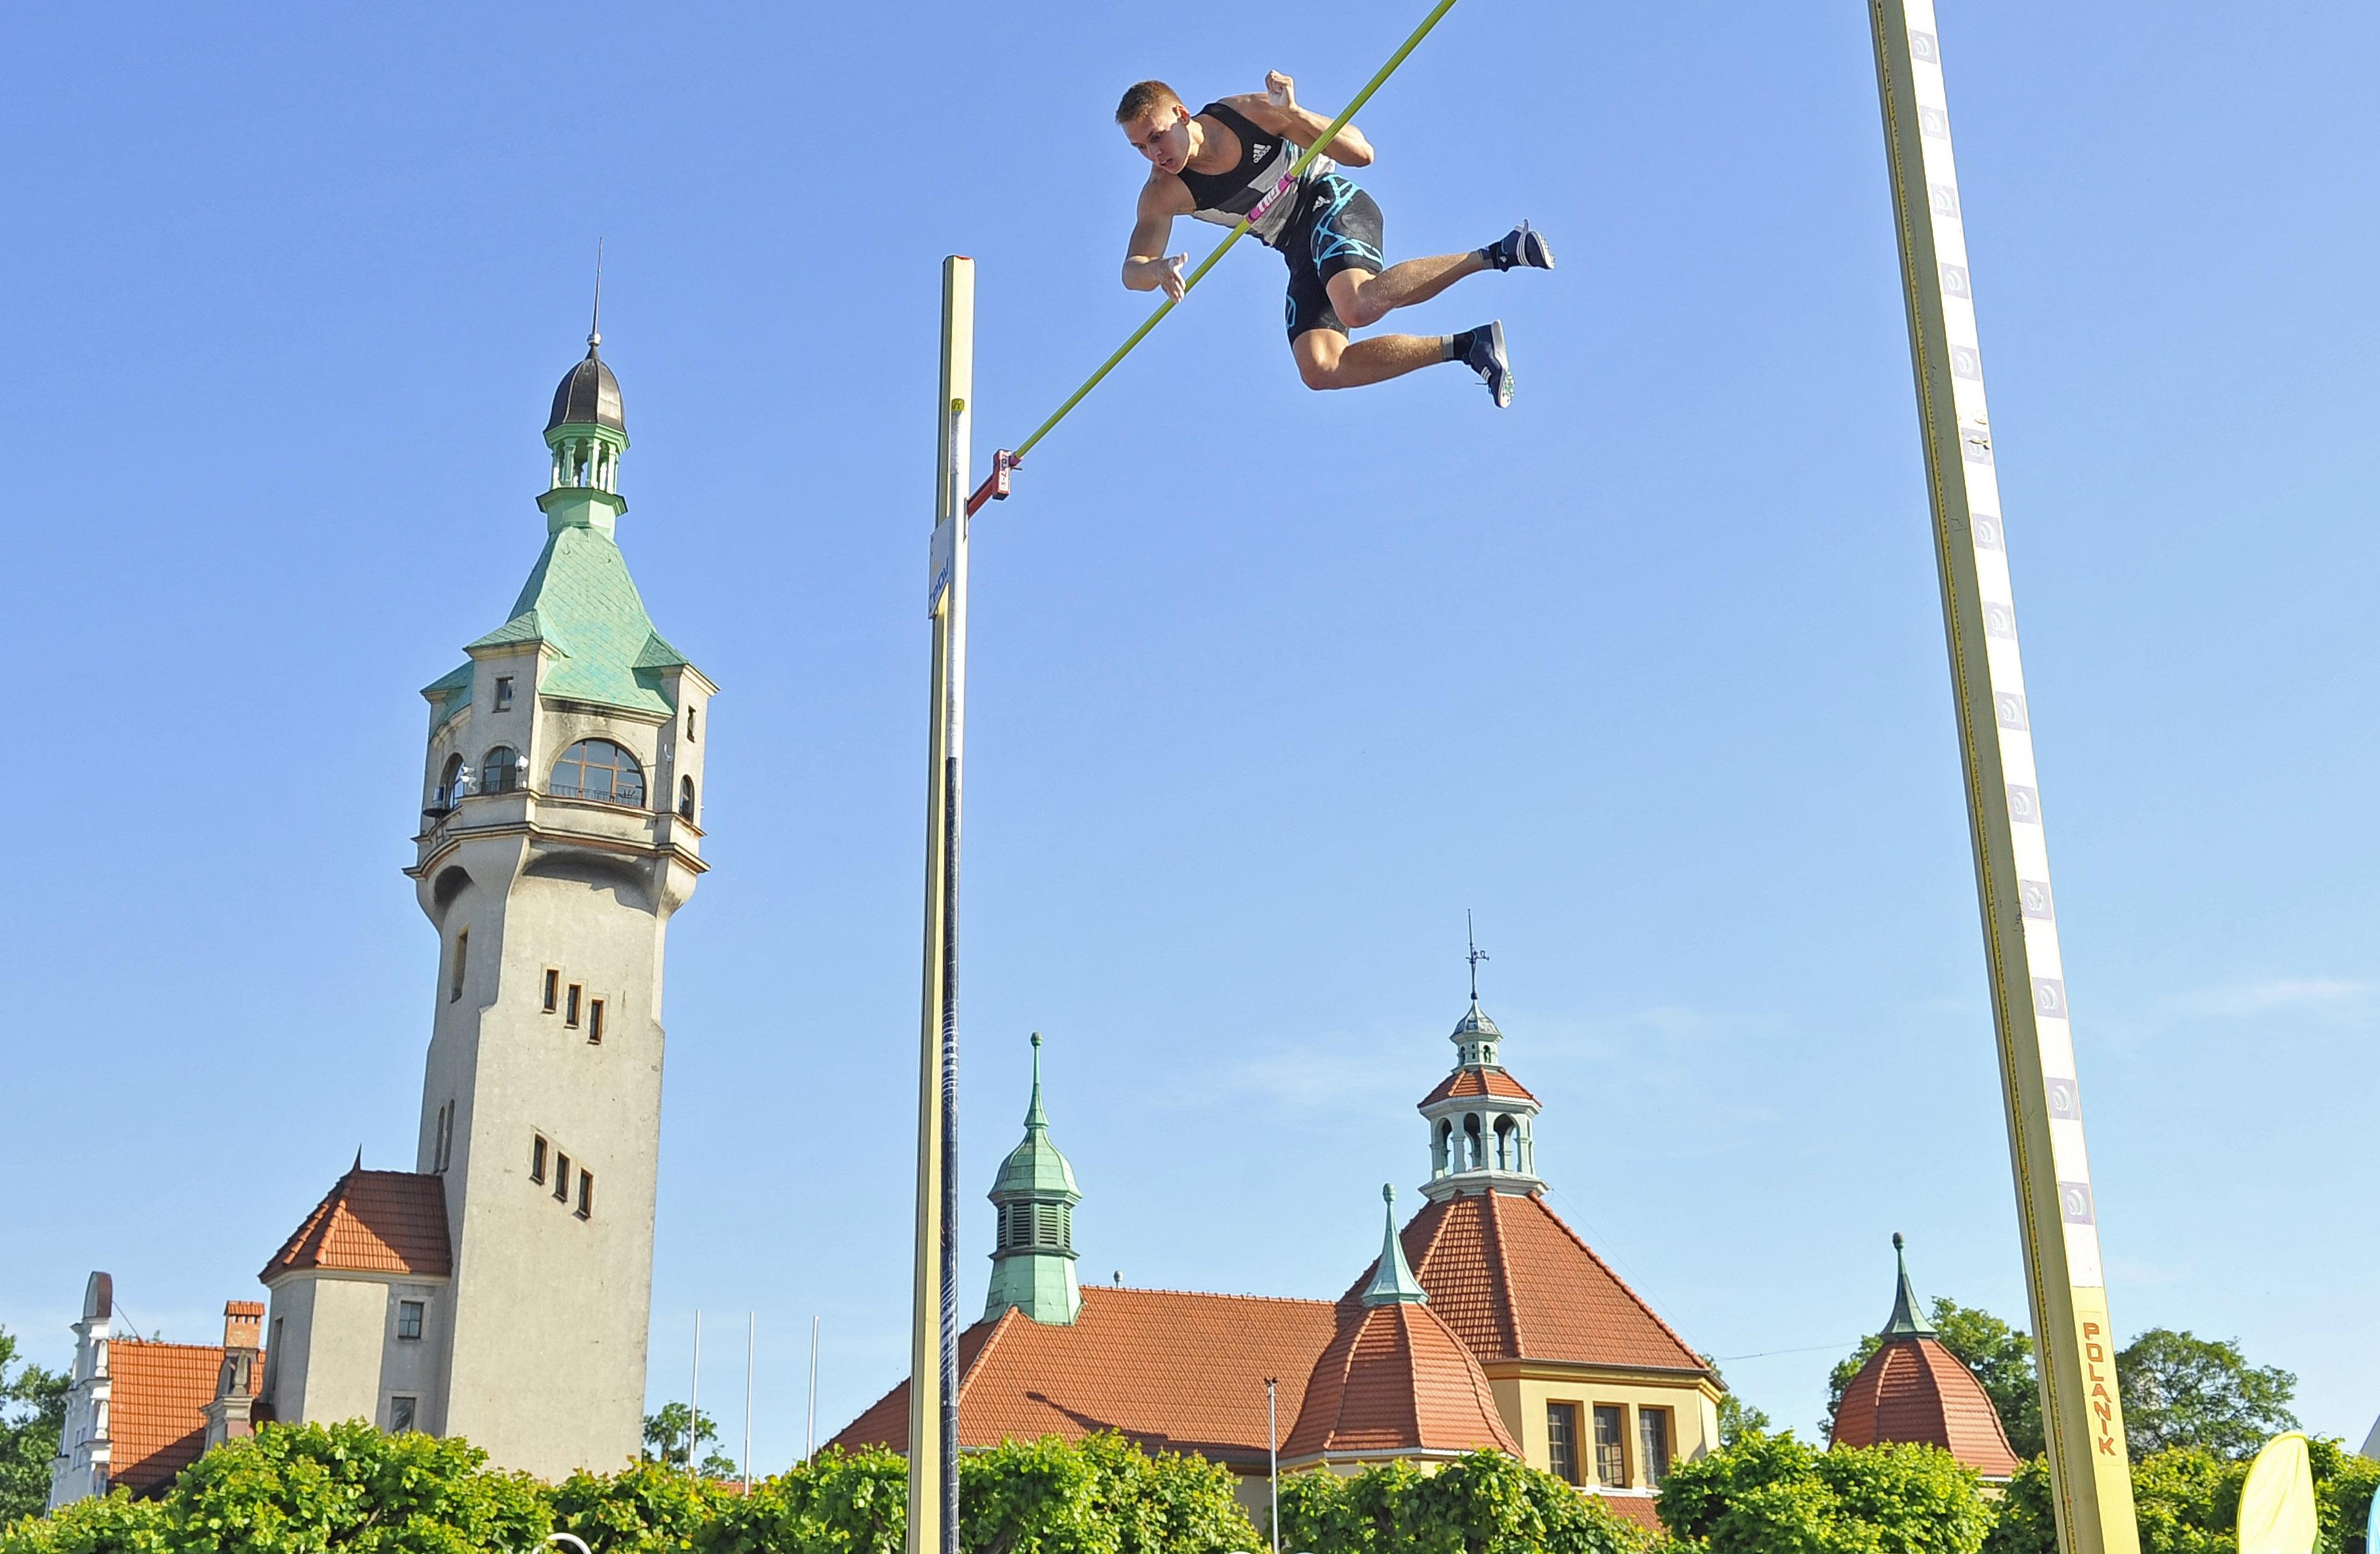 03.06.2016 Sopot. Plac Zdrojowy k. Molo. XXIX Konkurs Tyczka na Molo. N/z Robert Sobera. Fot. Jurek Bartkowski/Fotobank.PL/UMS